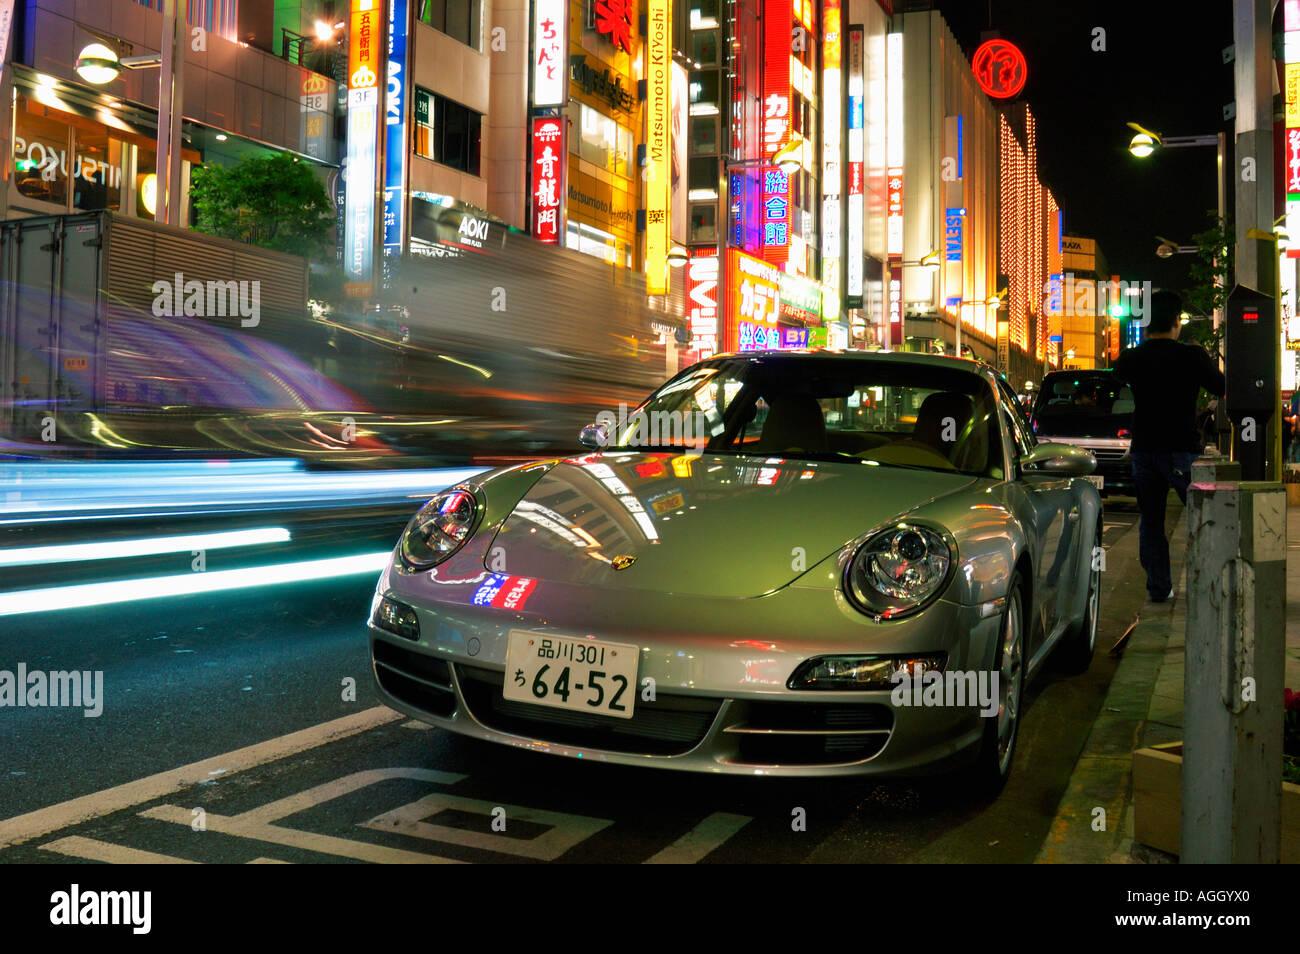 Awesome Cool Sports Car Parked Near Sidewalk, Shinjuku, Tokyo, Japan